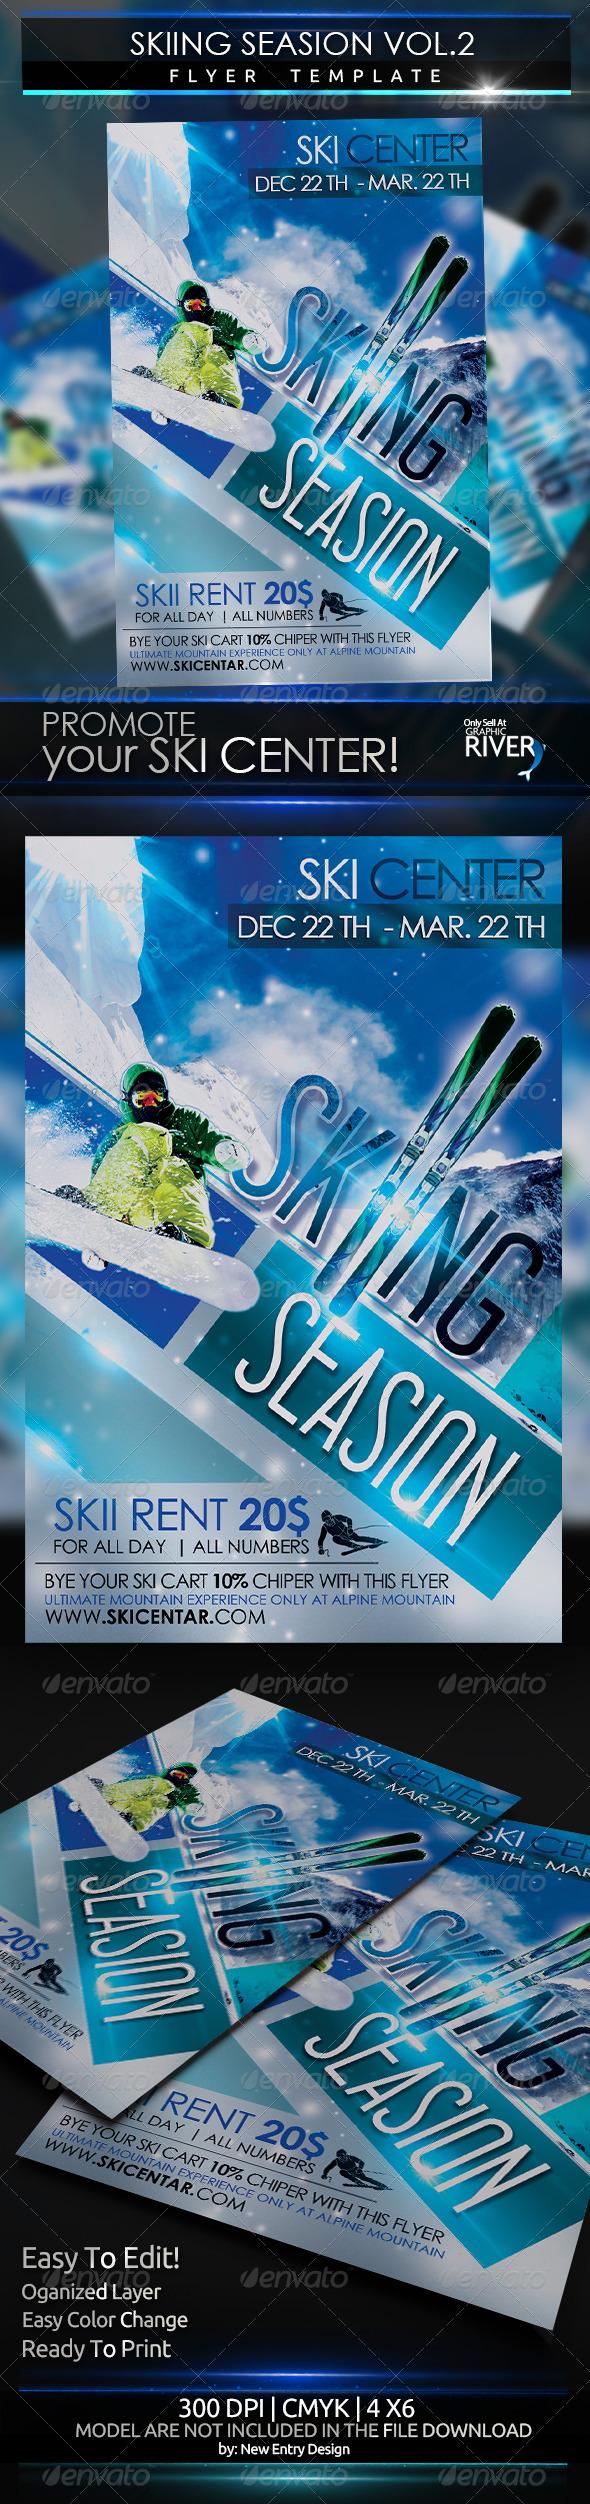 Skiing Season Flyer Template Vol 2 - Sports Events